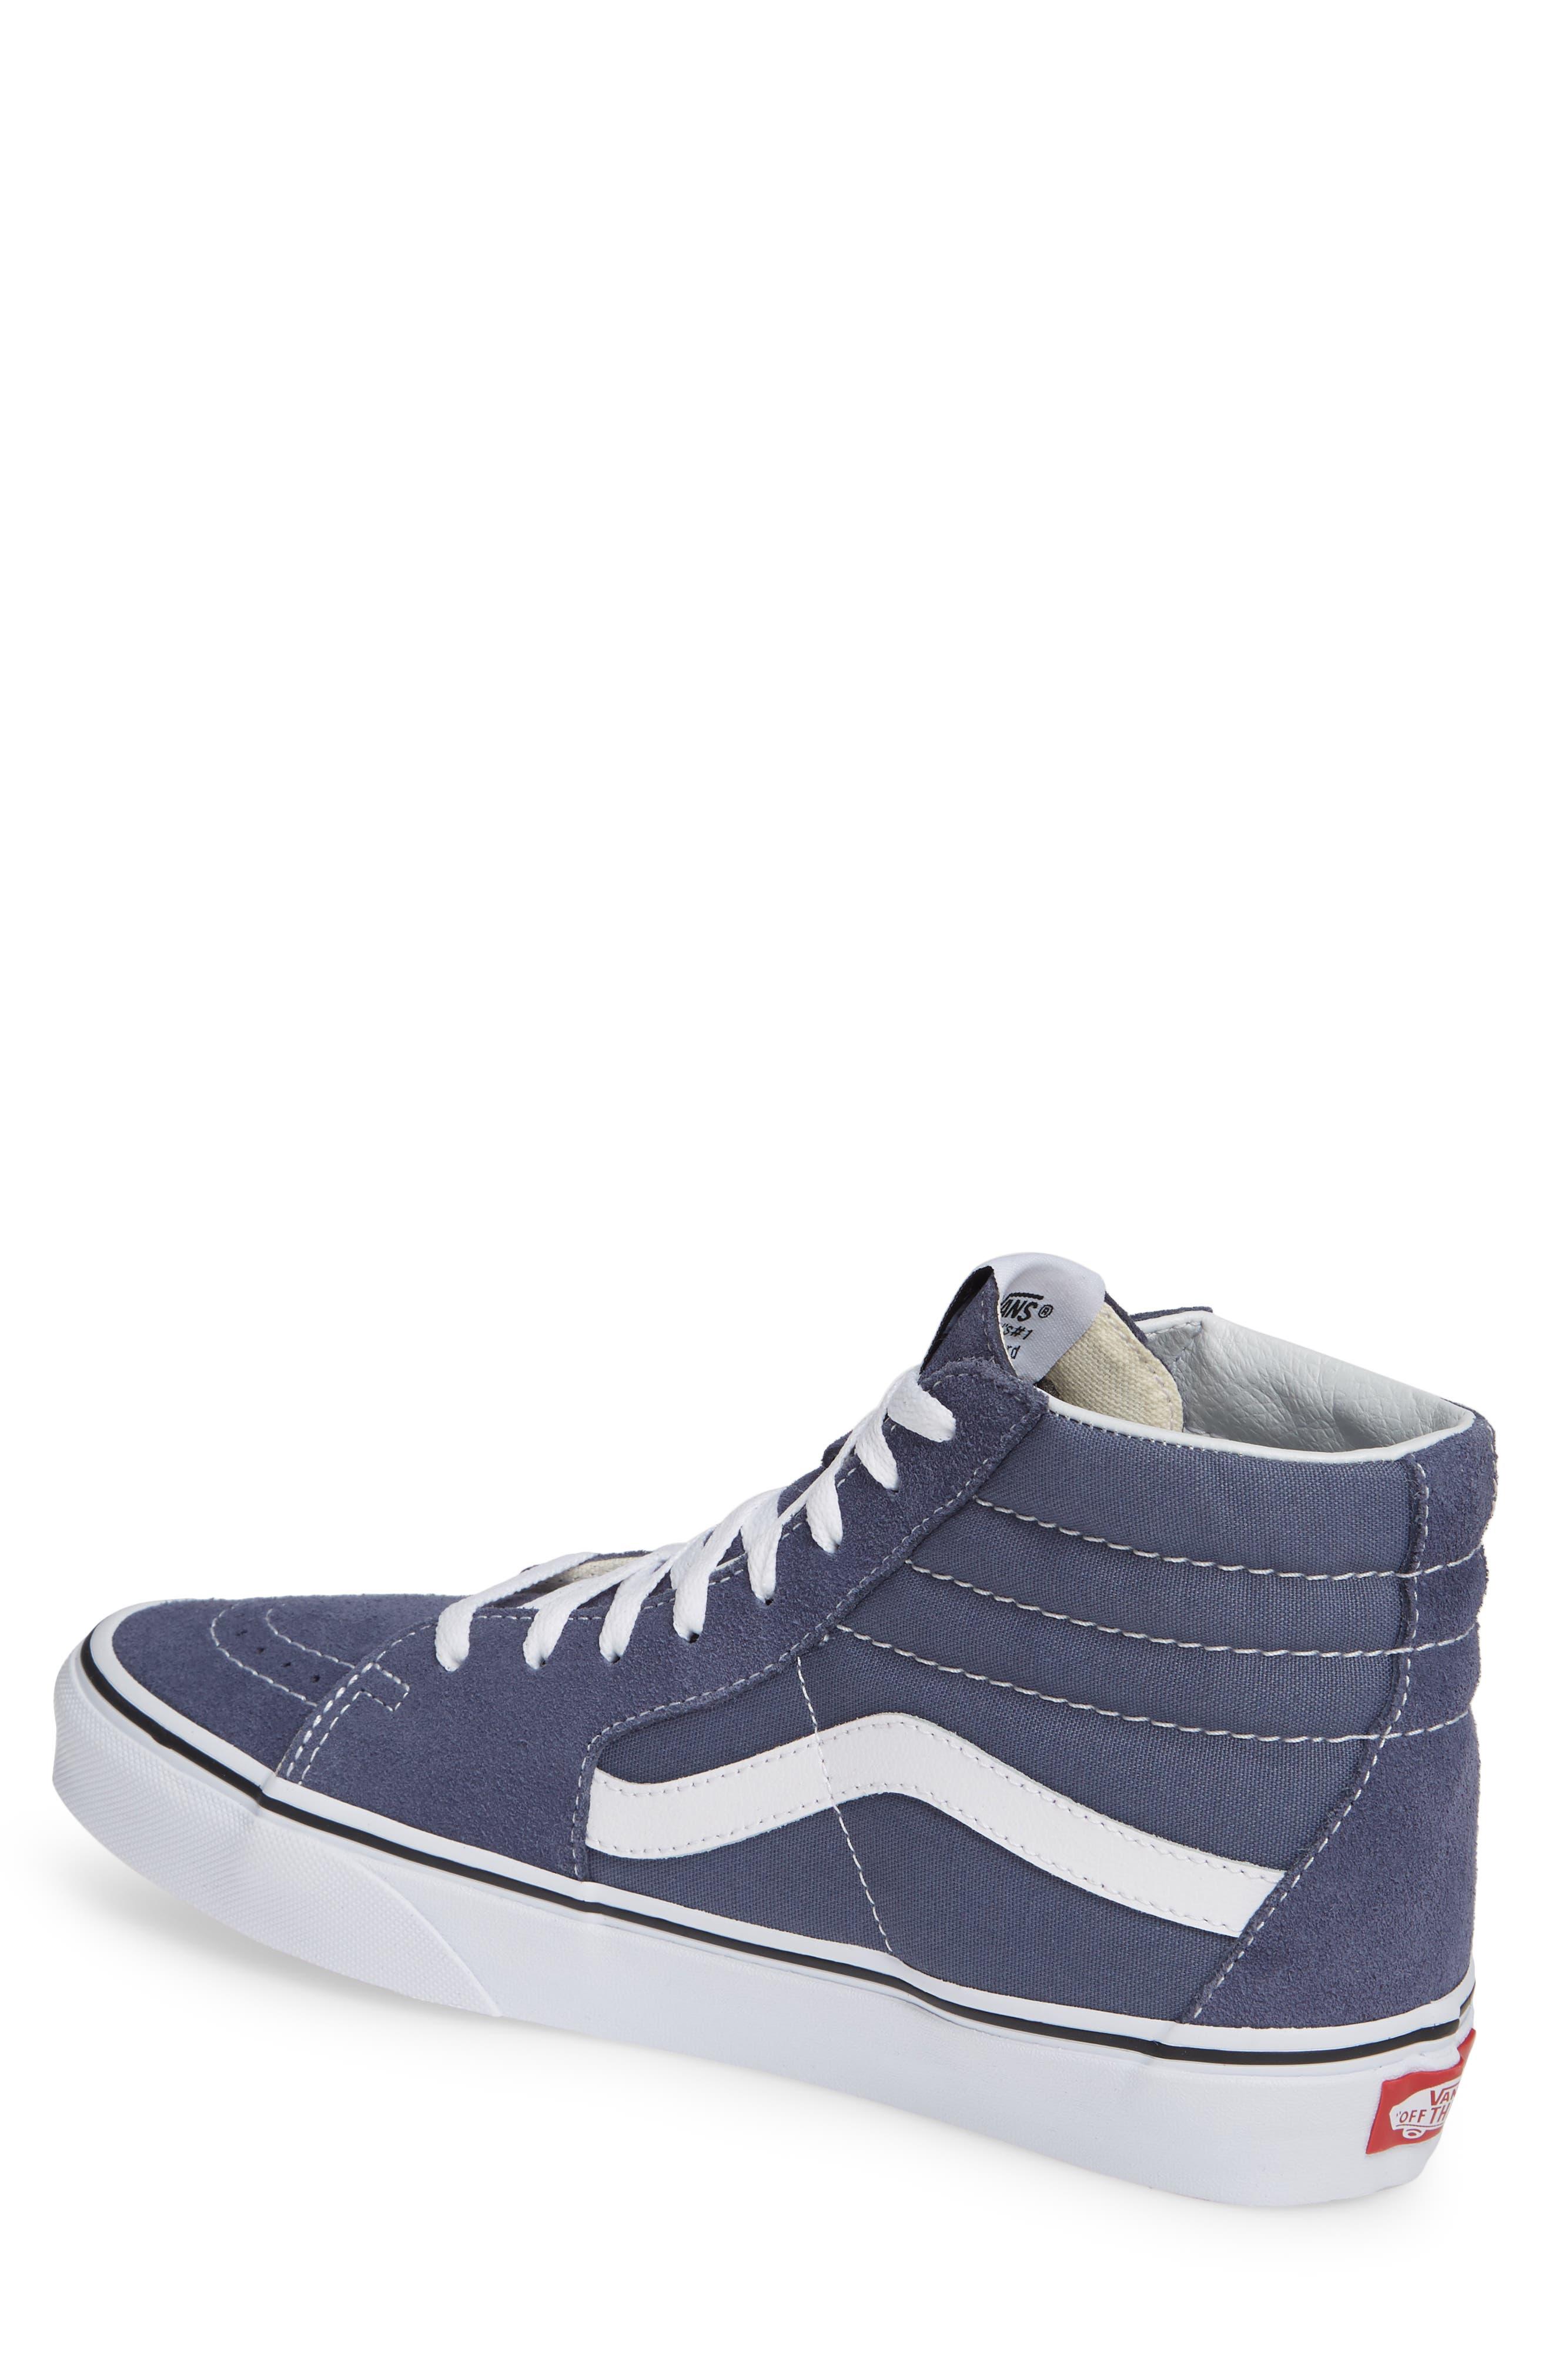 'Sk8-Hi' Sneaker,                             Alternate thumbnail 2, color,                             GREY/ TRUE WHITE